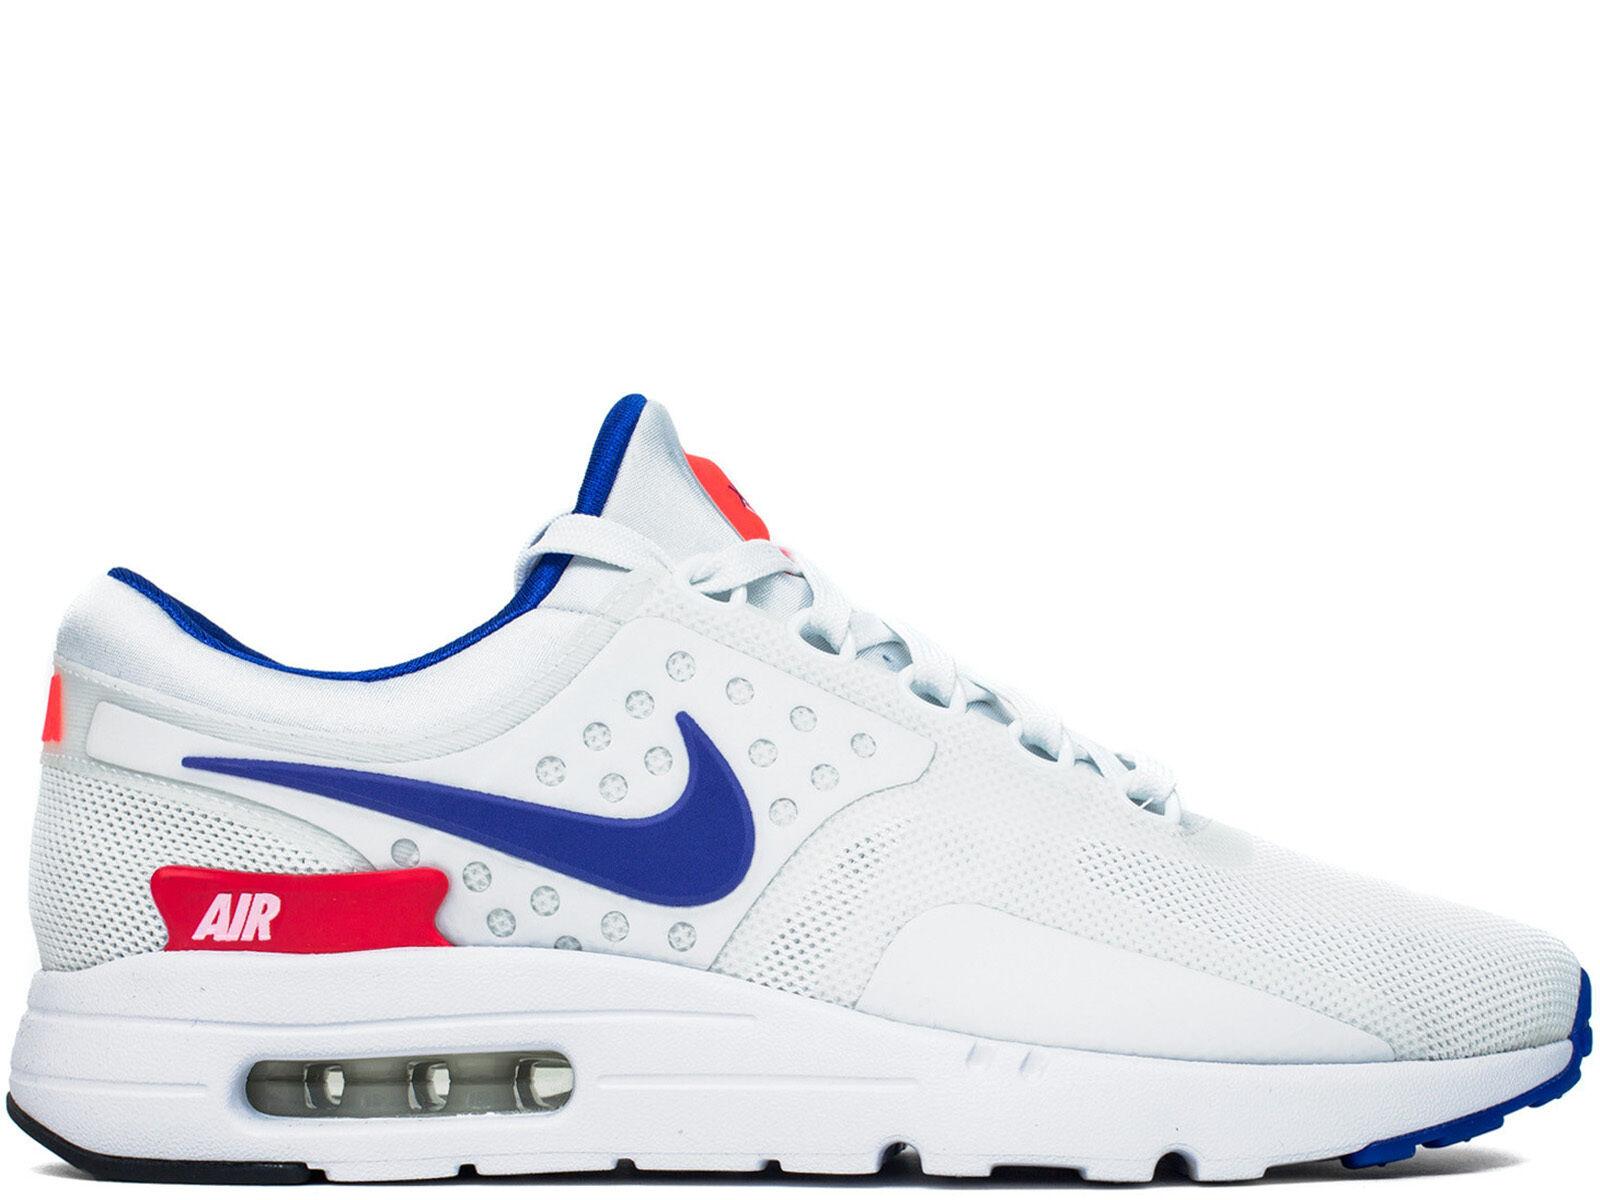 e261fa34bd328 70%OFF Size 10 Men s Nike Air Max Zero QS 789695 105 Athletic Fashion  Sneakers